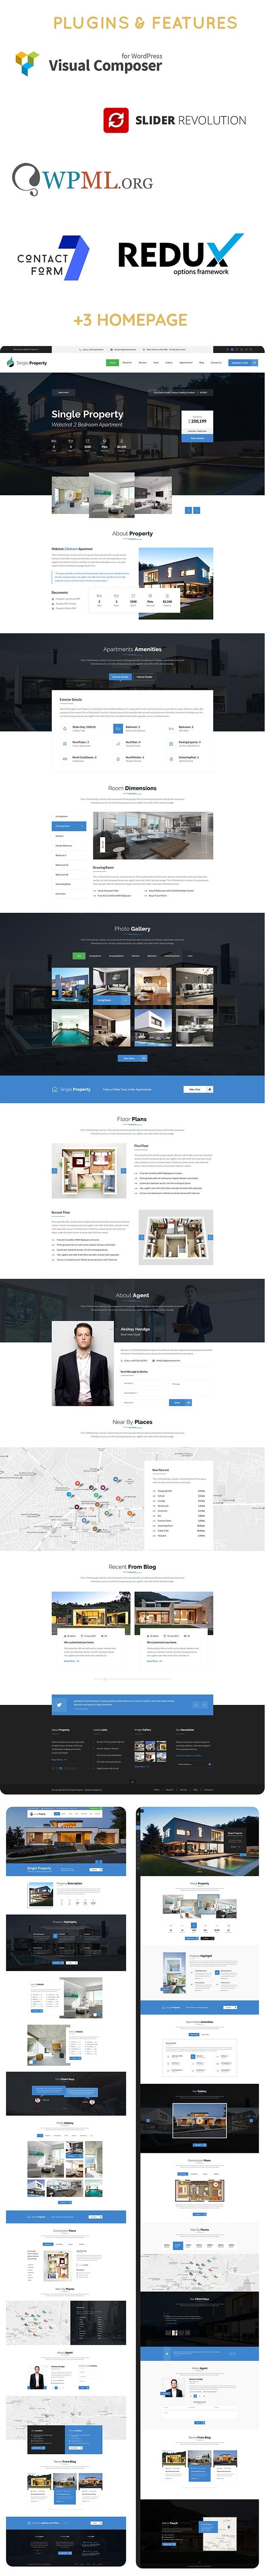 PatelProperty - Single Property Immobilien WordPress Theme - 6